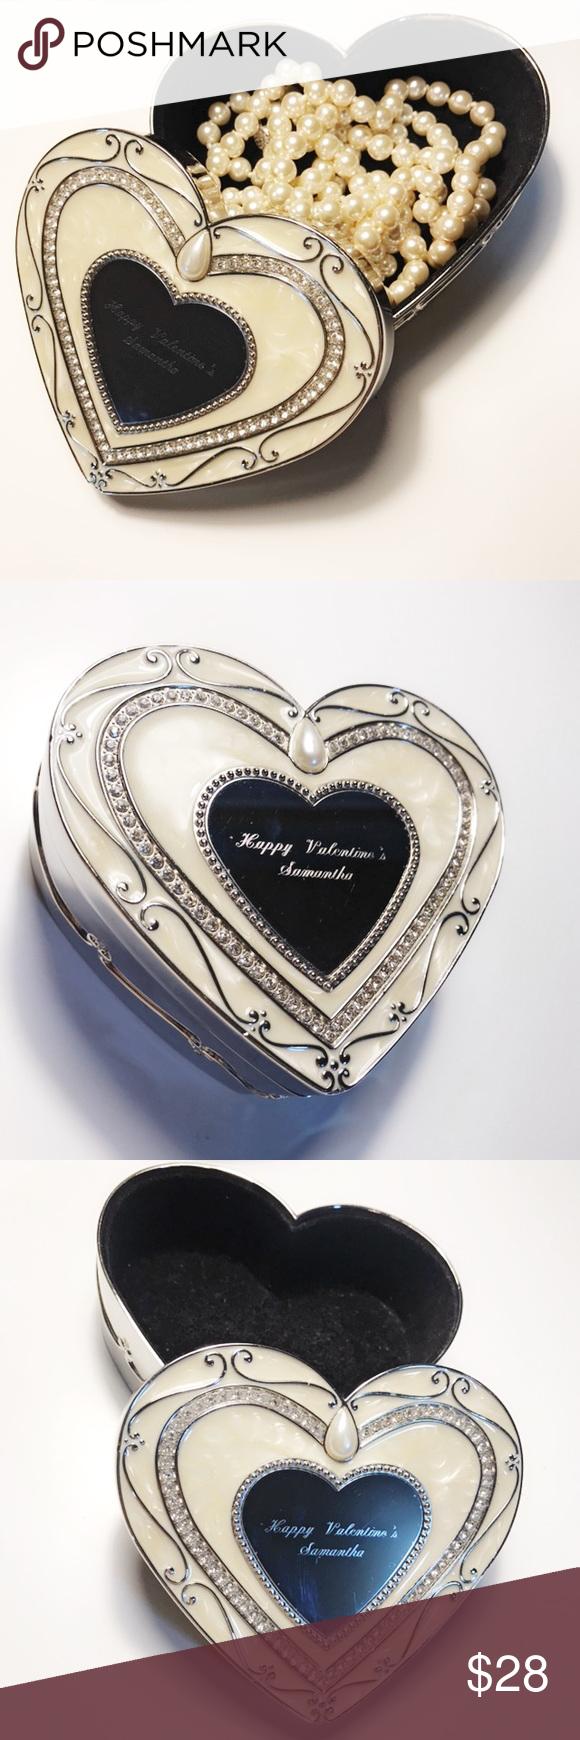 Things Remembered Elegance Keepsake Jewelry Box Heart shaped